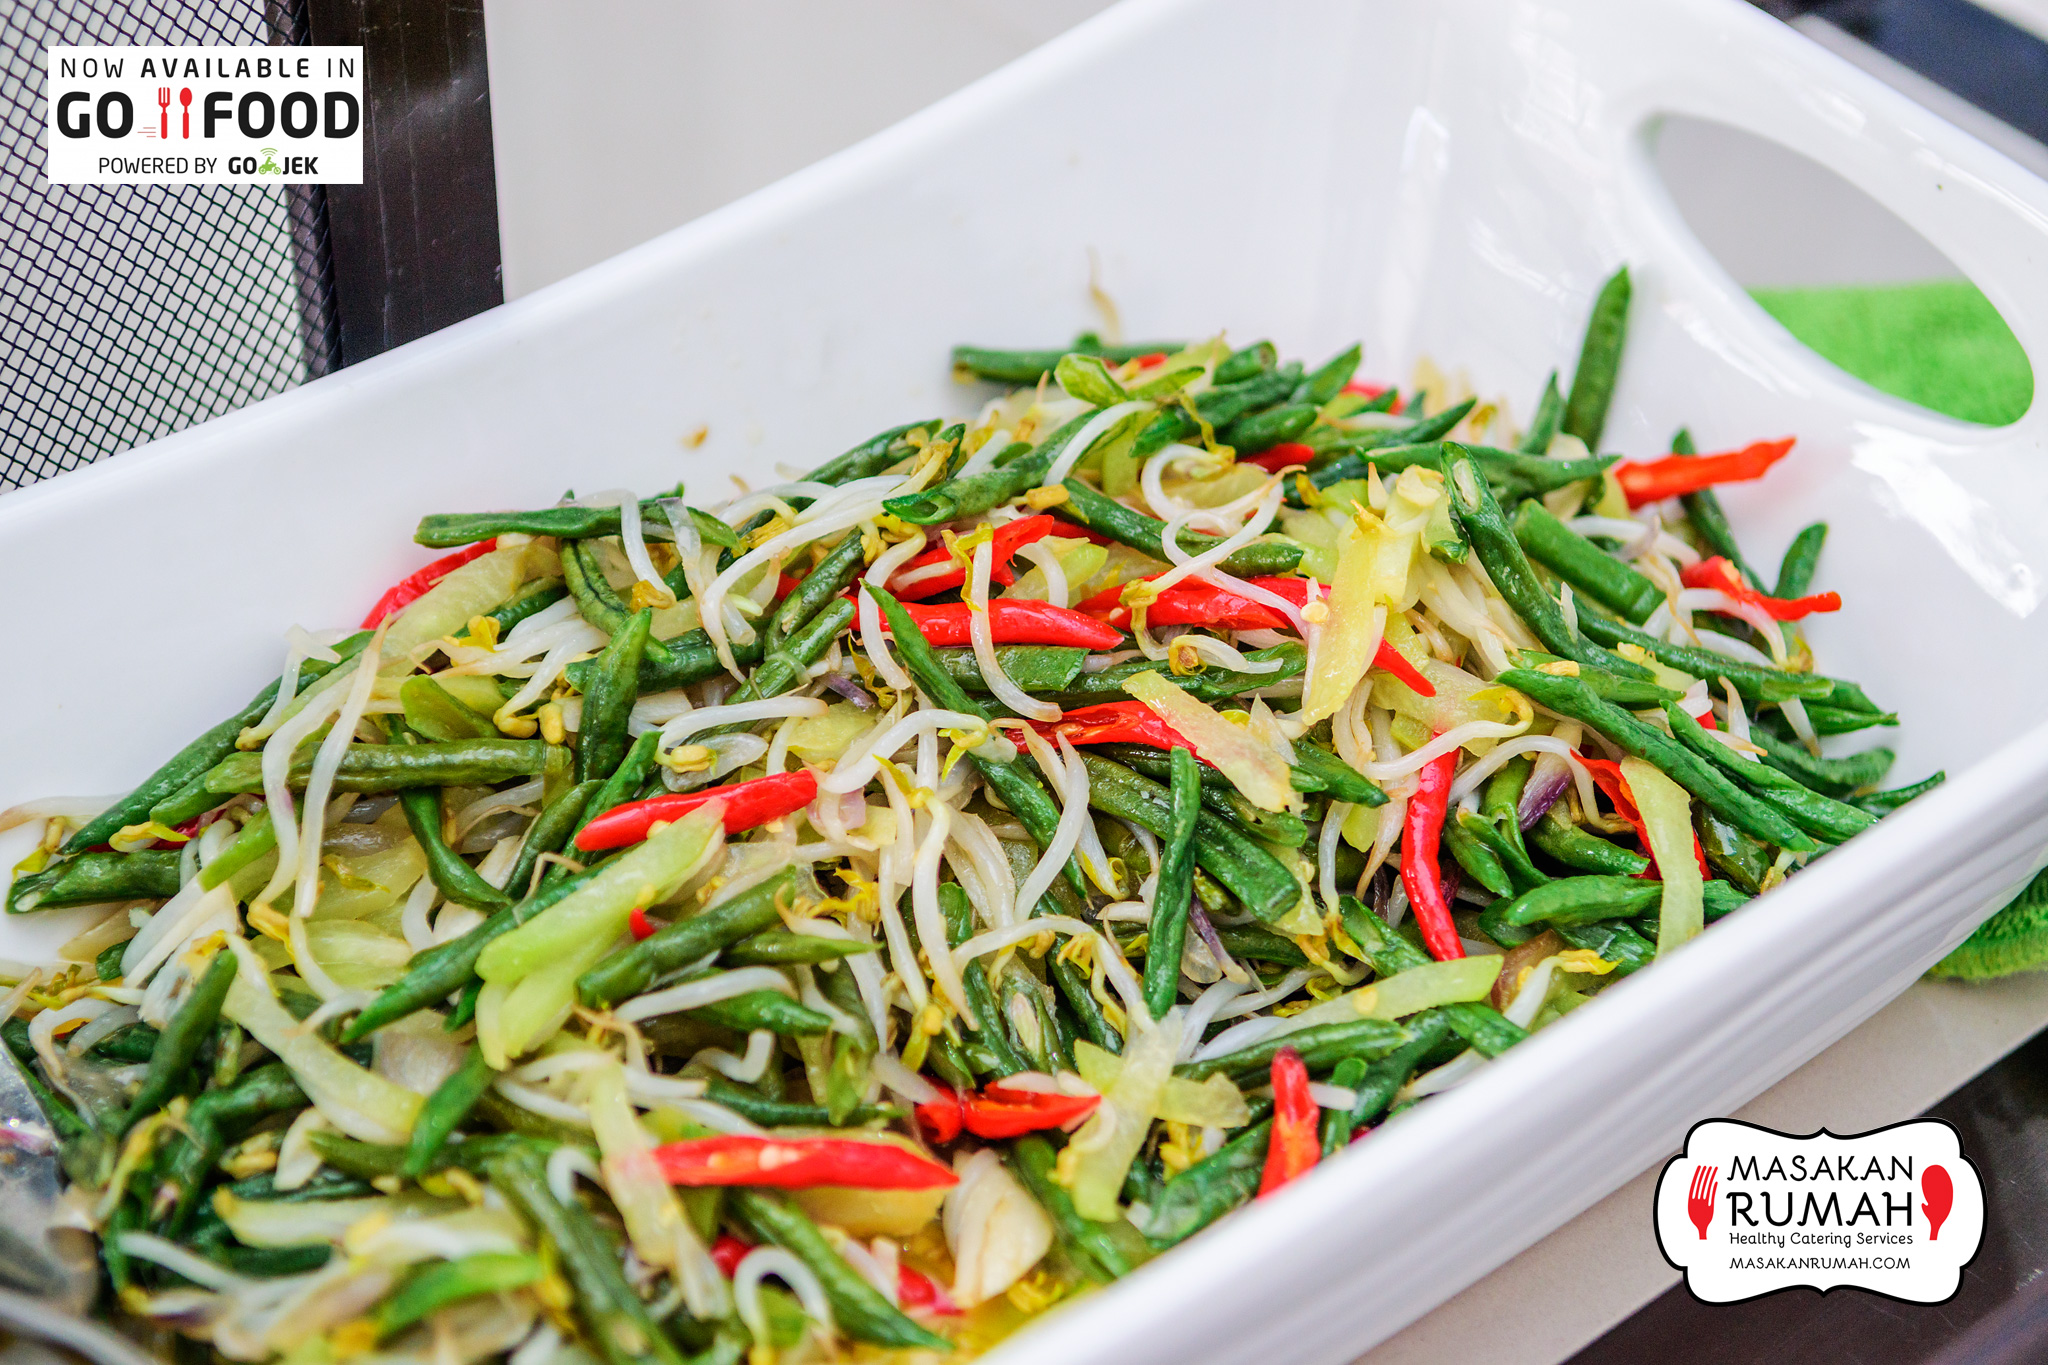 Aneka sayur masakan rumah